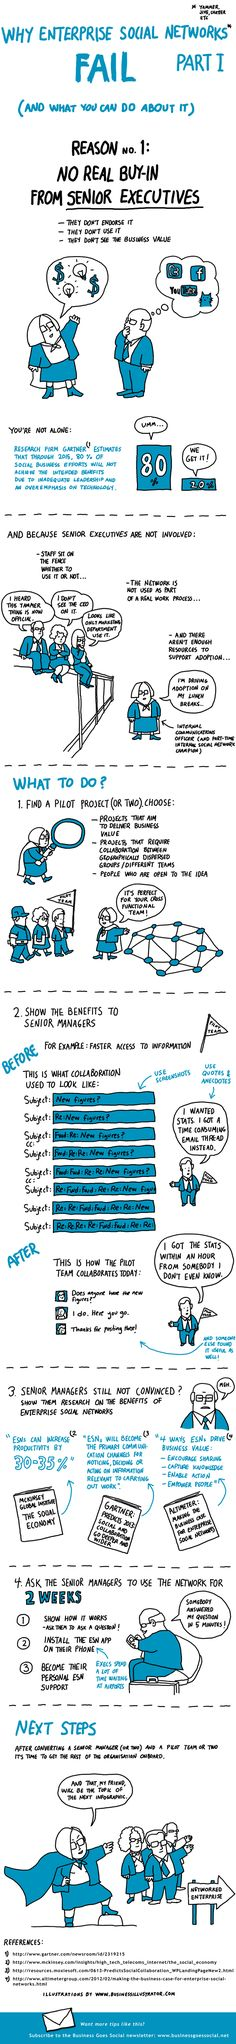 Why Enterprise Social Networks Fail